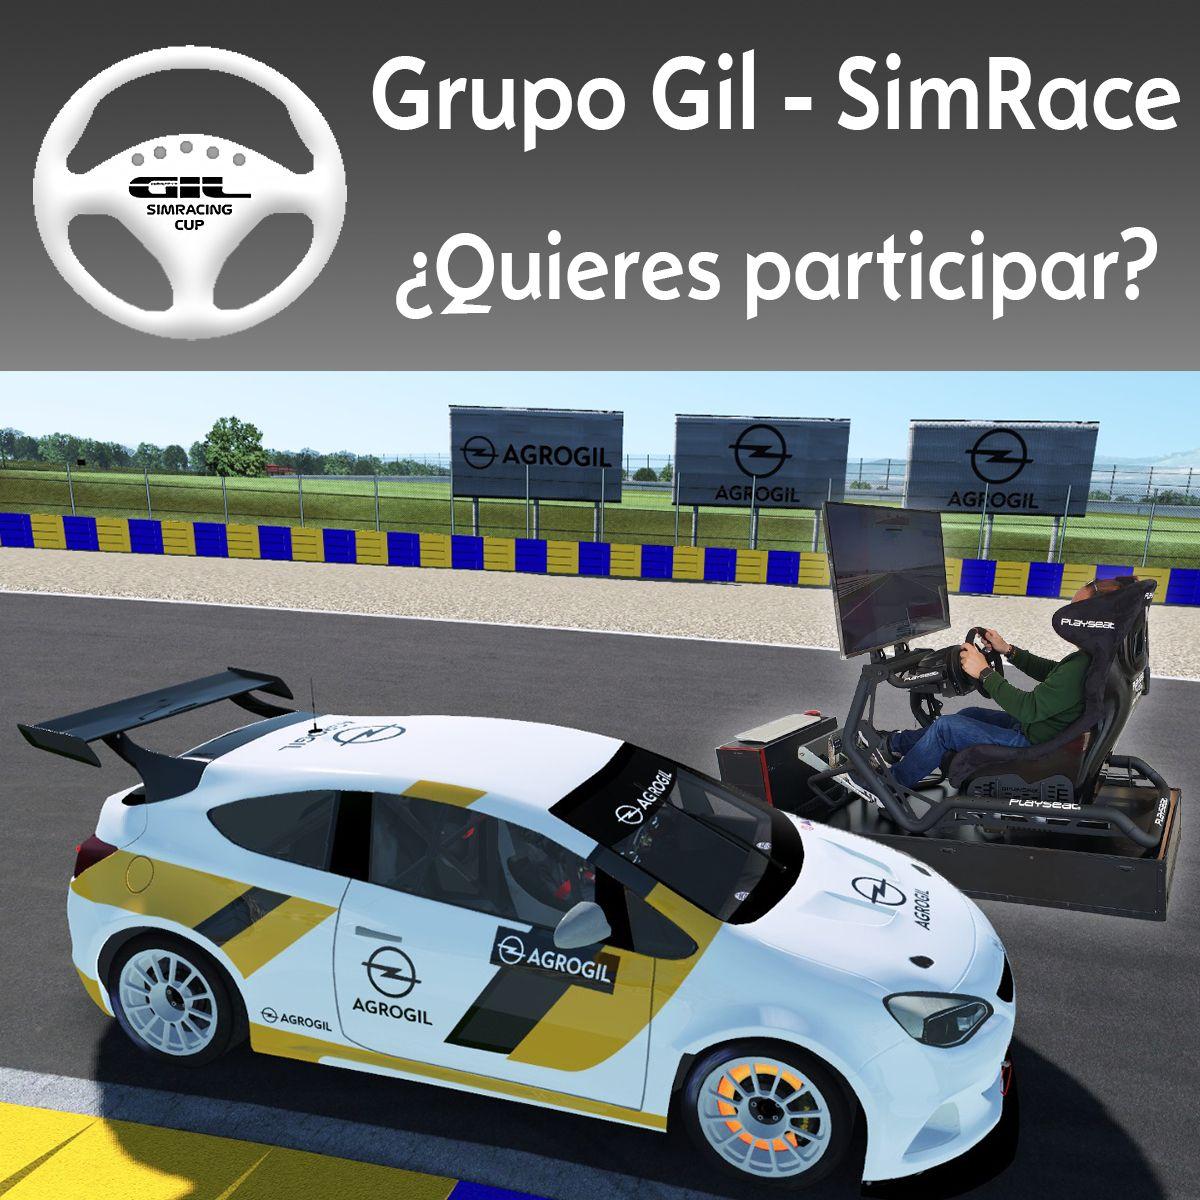 2º RONDA DEL CAMPEONATO GRUPO GIL - SIMRACING CUP